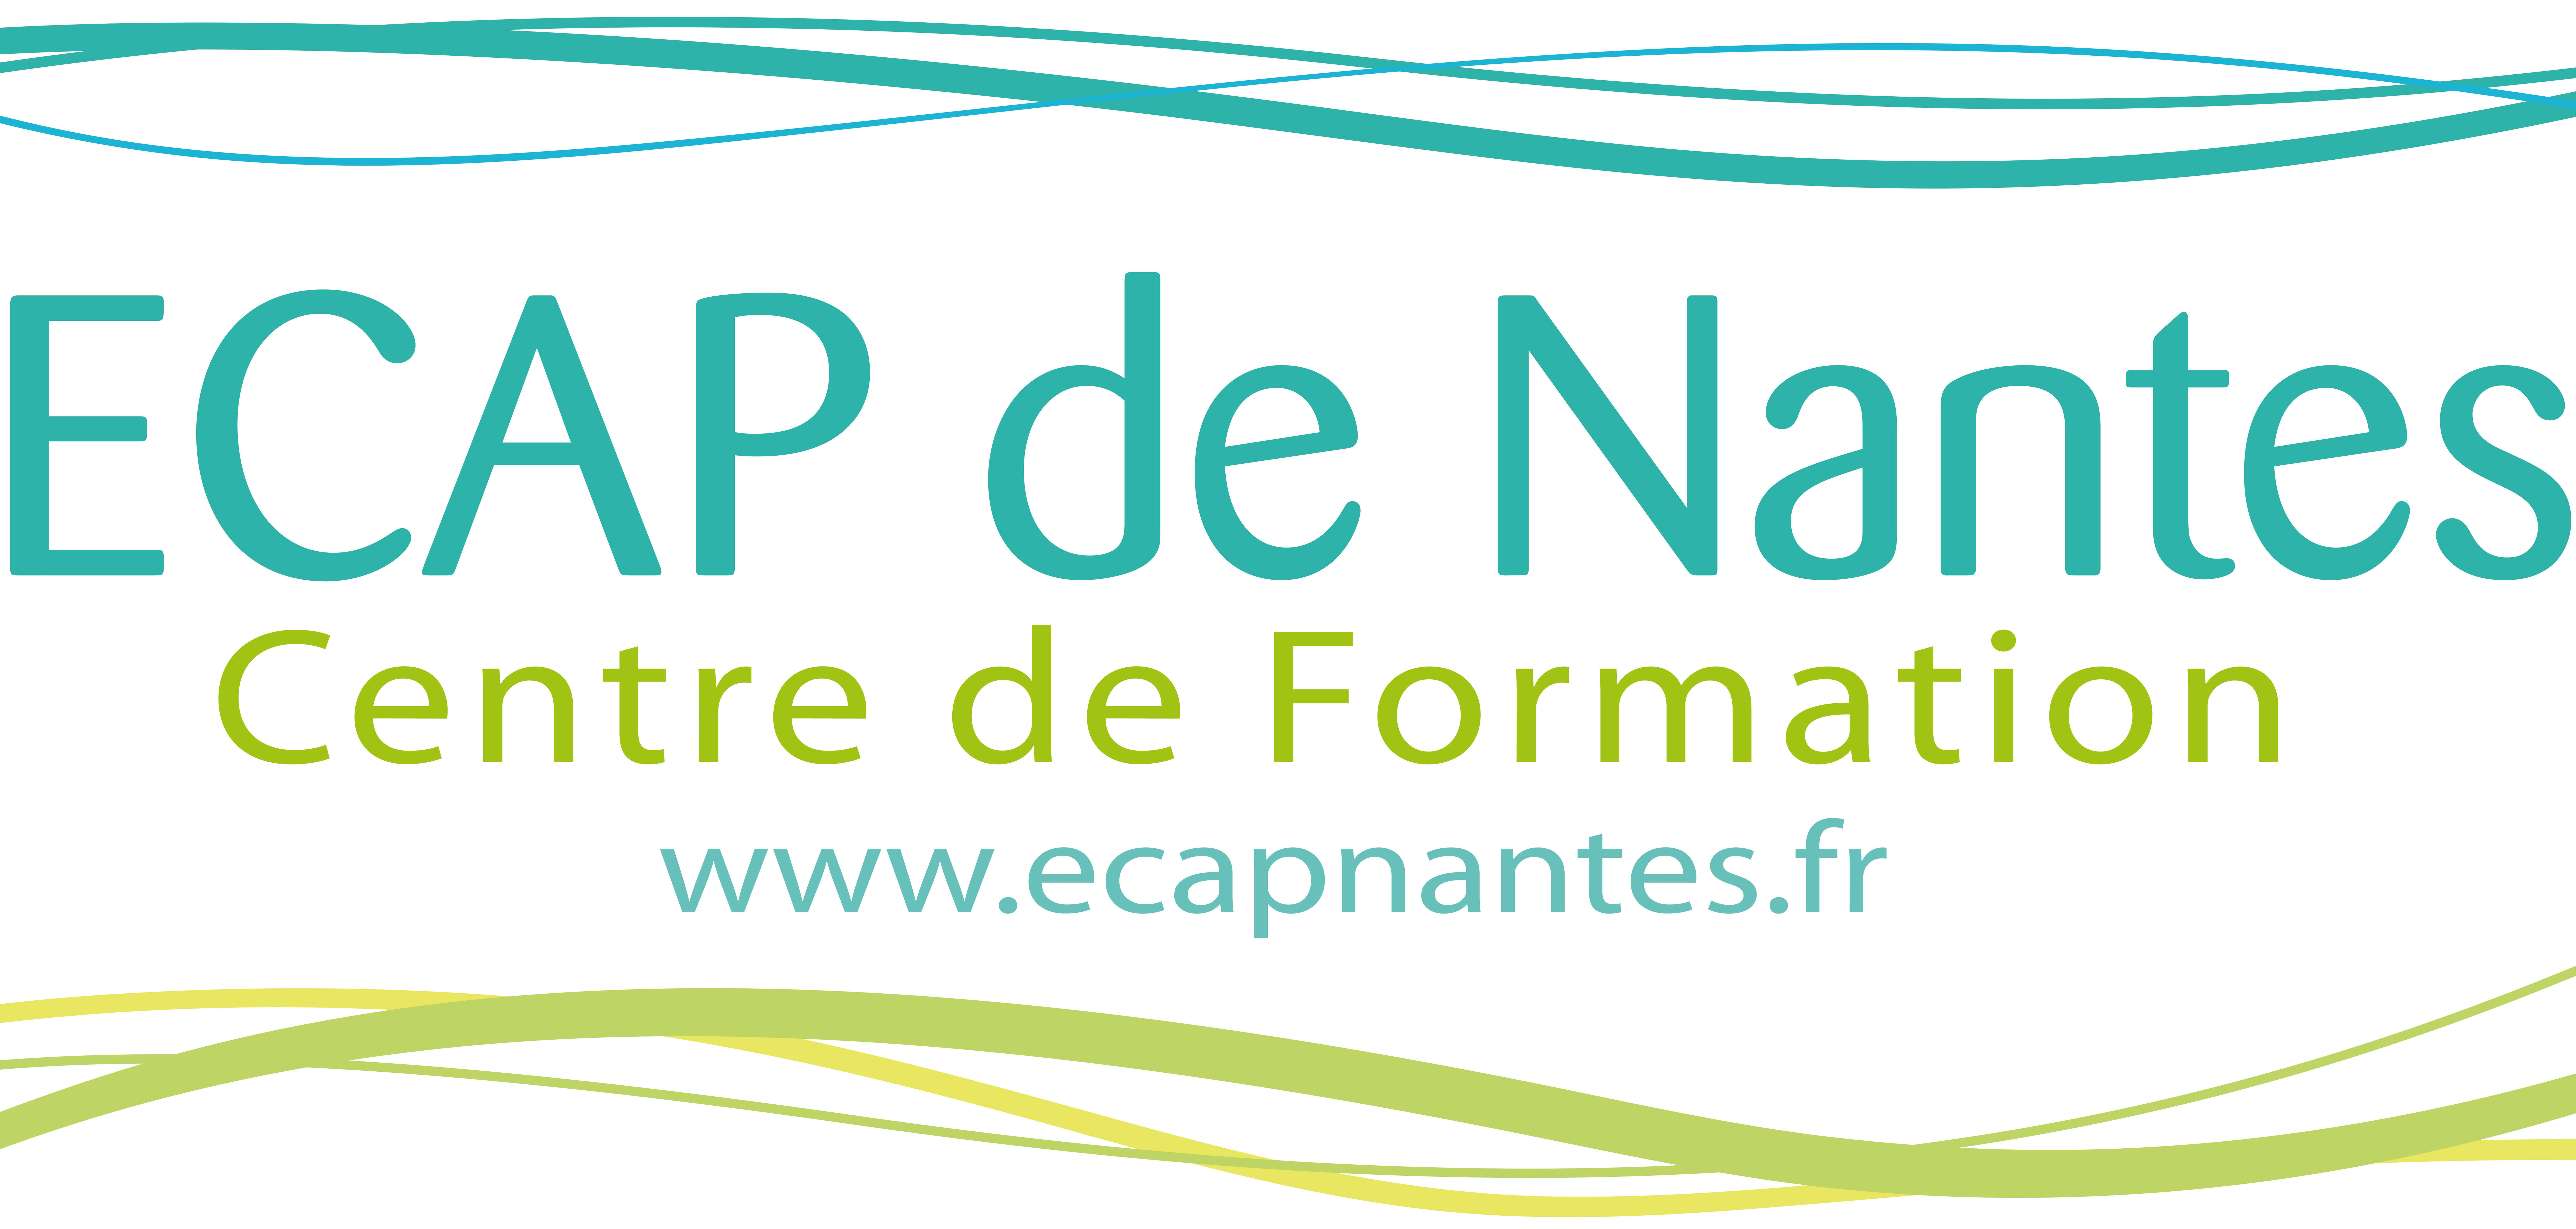 ECAP de Nantes - Ecole de Kinésiologie Internationale